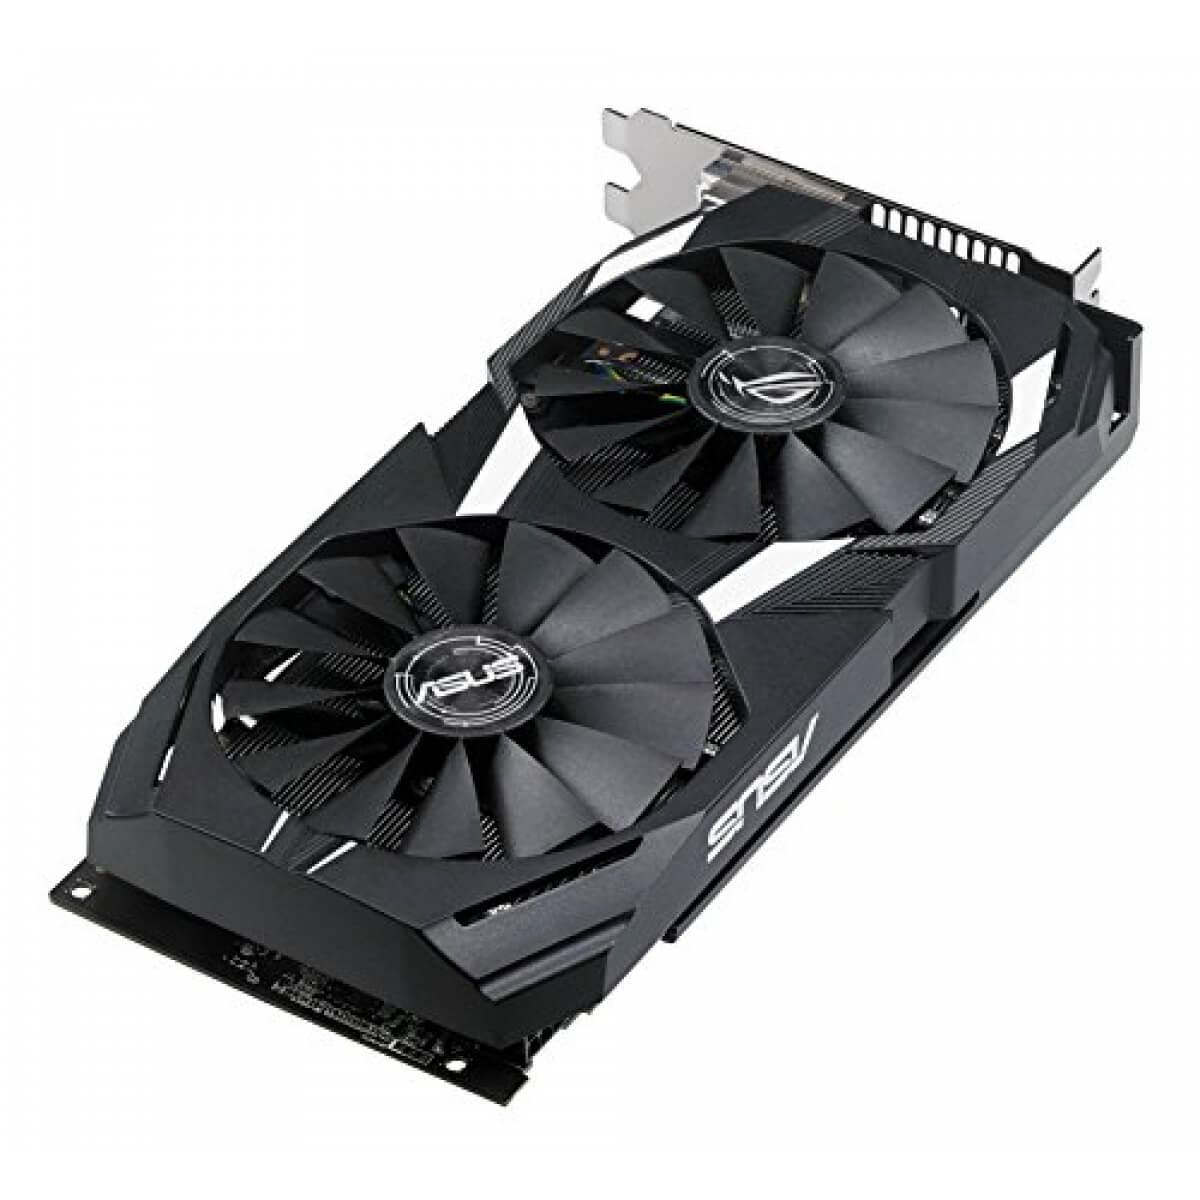 Placa de Vídeo ASUS RX 580 4GB Radeon Dual OC 4GB DUAL-RX580-O4G GDDR5